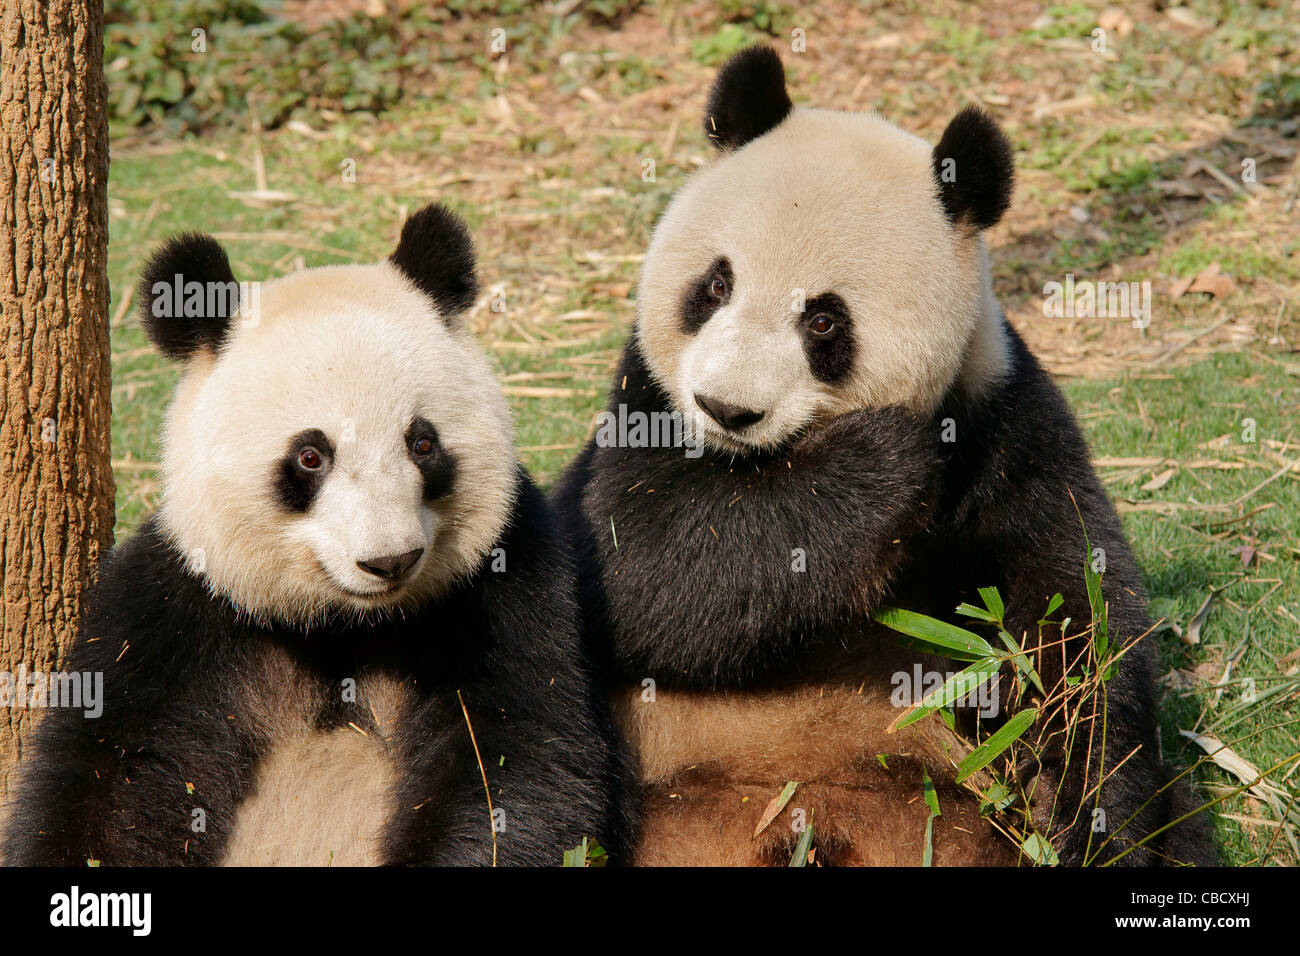 Pandas Essen Bambus Sprossen In China Stockfoto Bild 41466254 Alamy